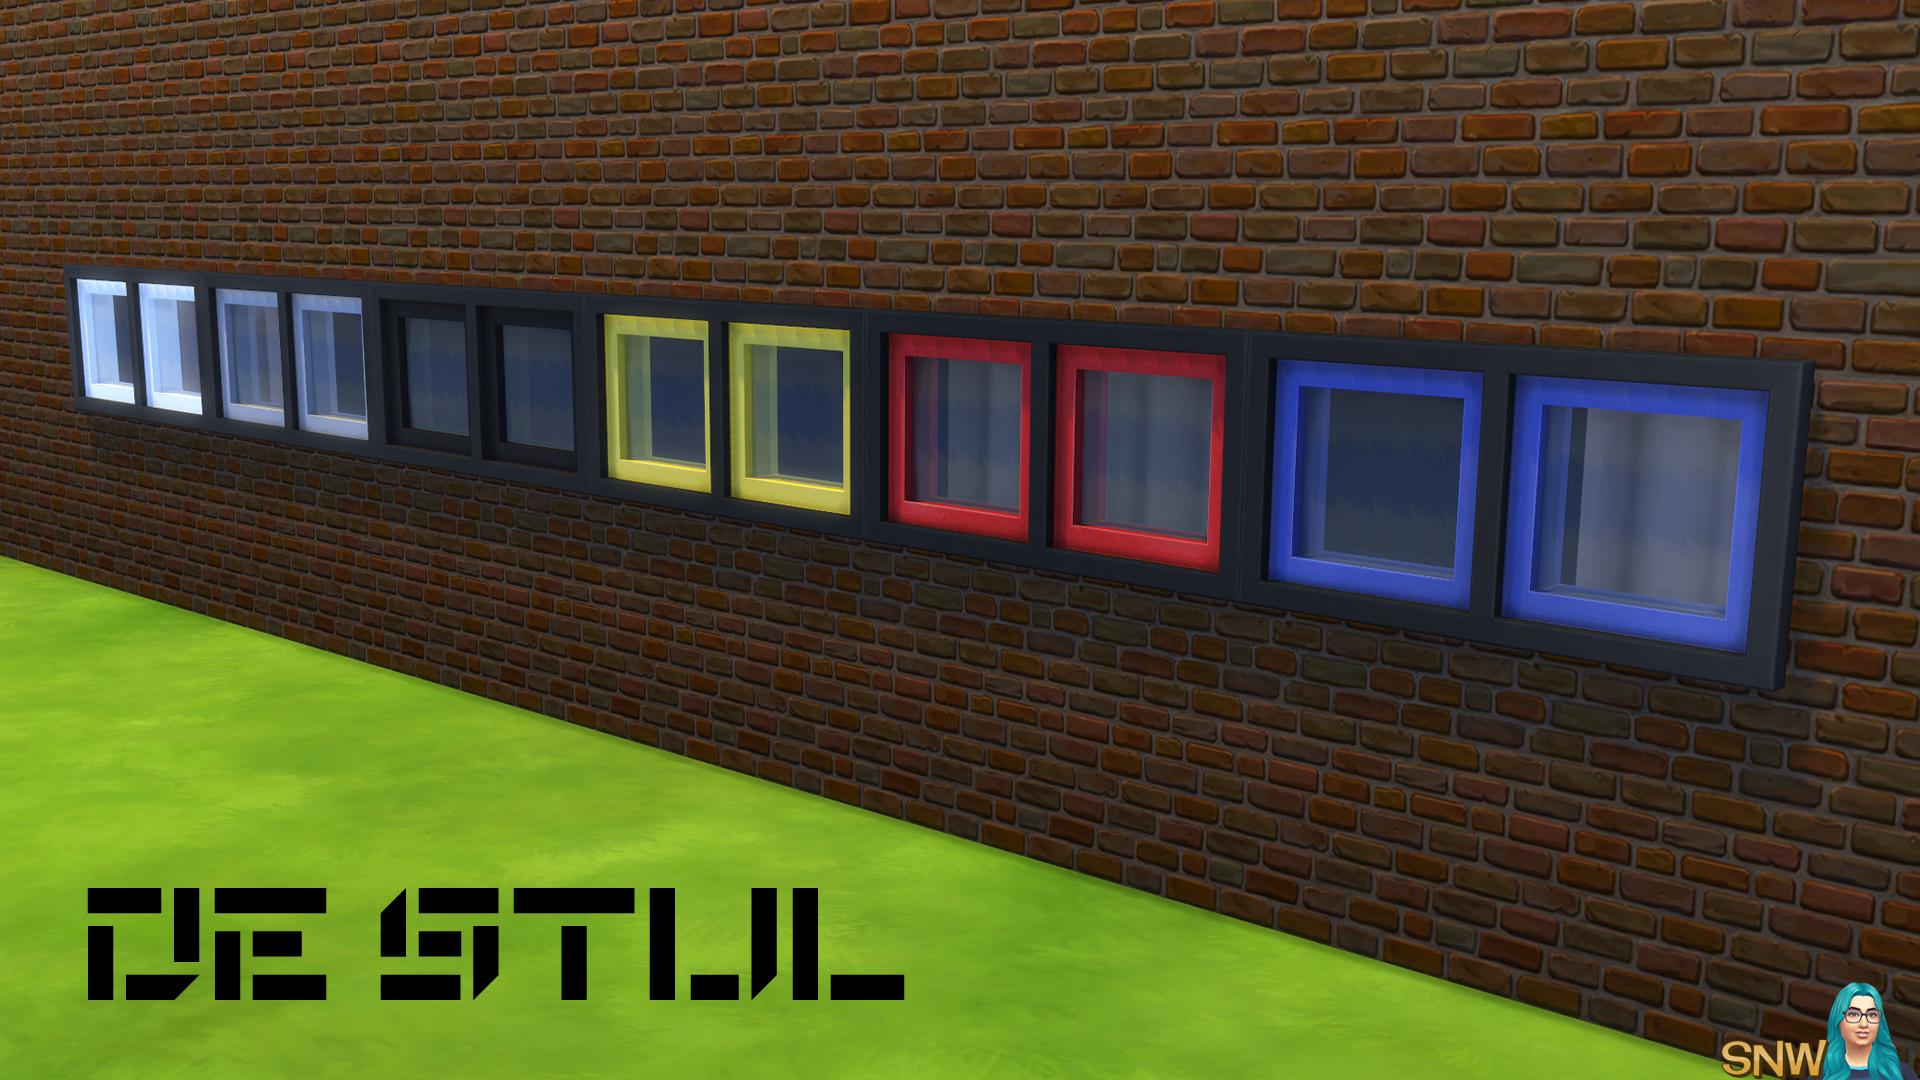 De Stijl Double Square Window 7 Snw Simsnetwork Com